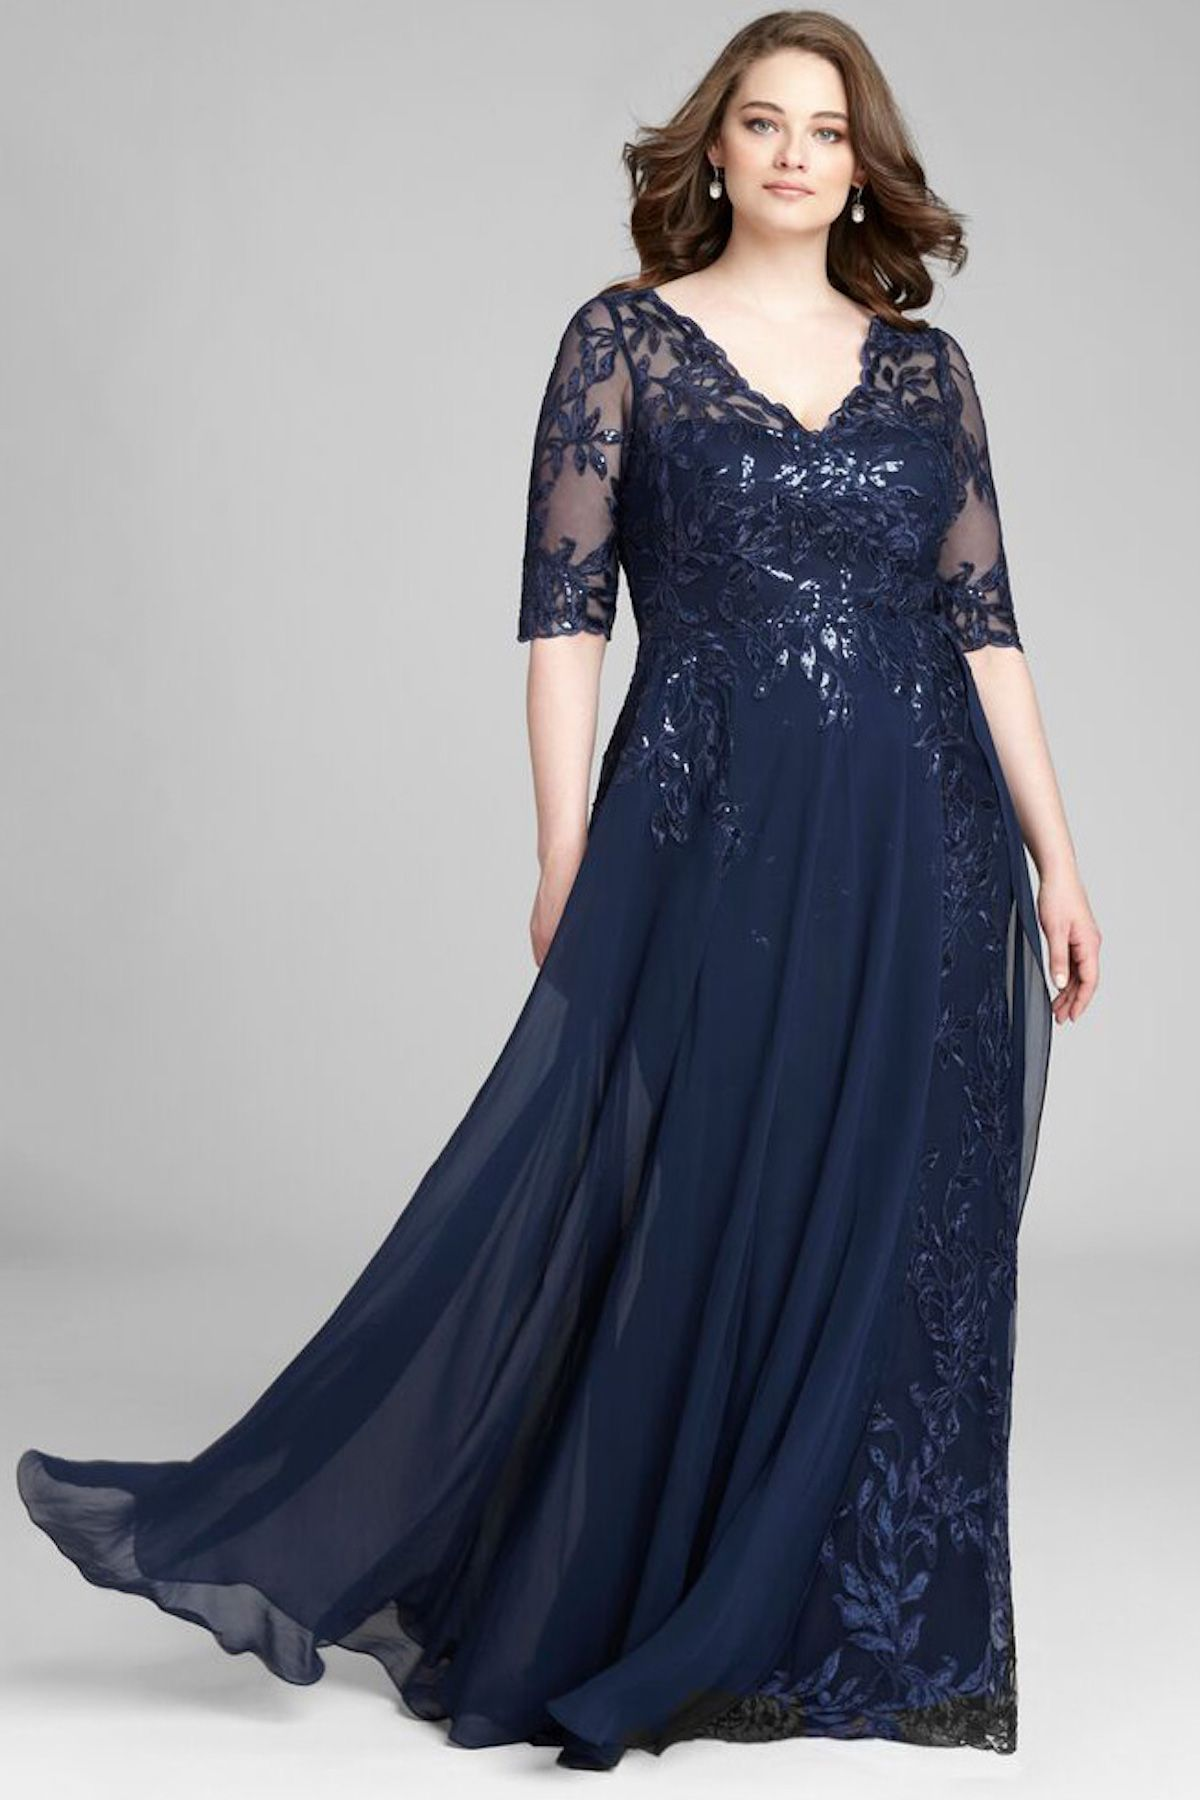 Plus Size Dresses For A Black Tie Wedding - raveitsafe